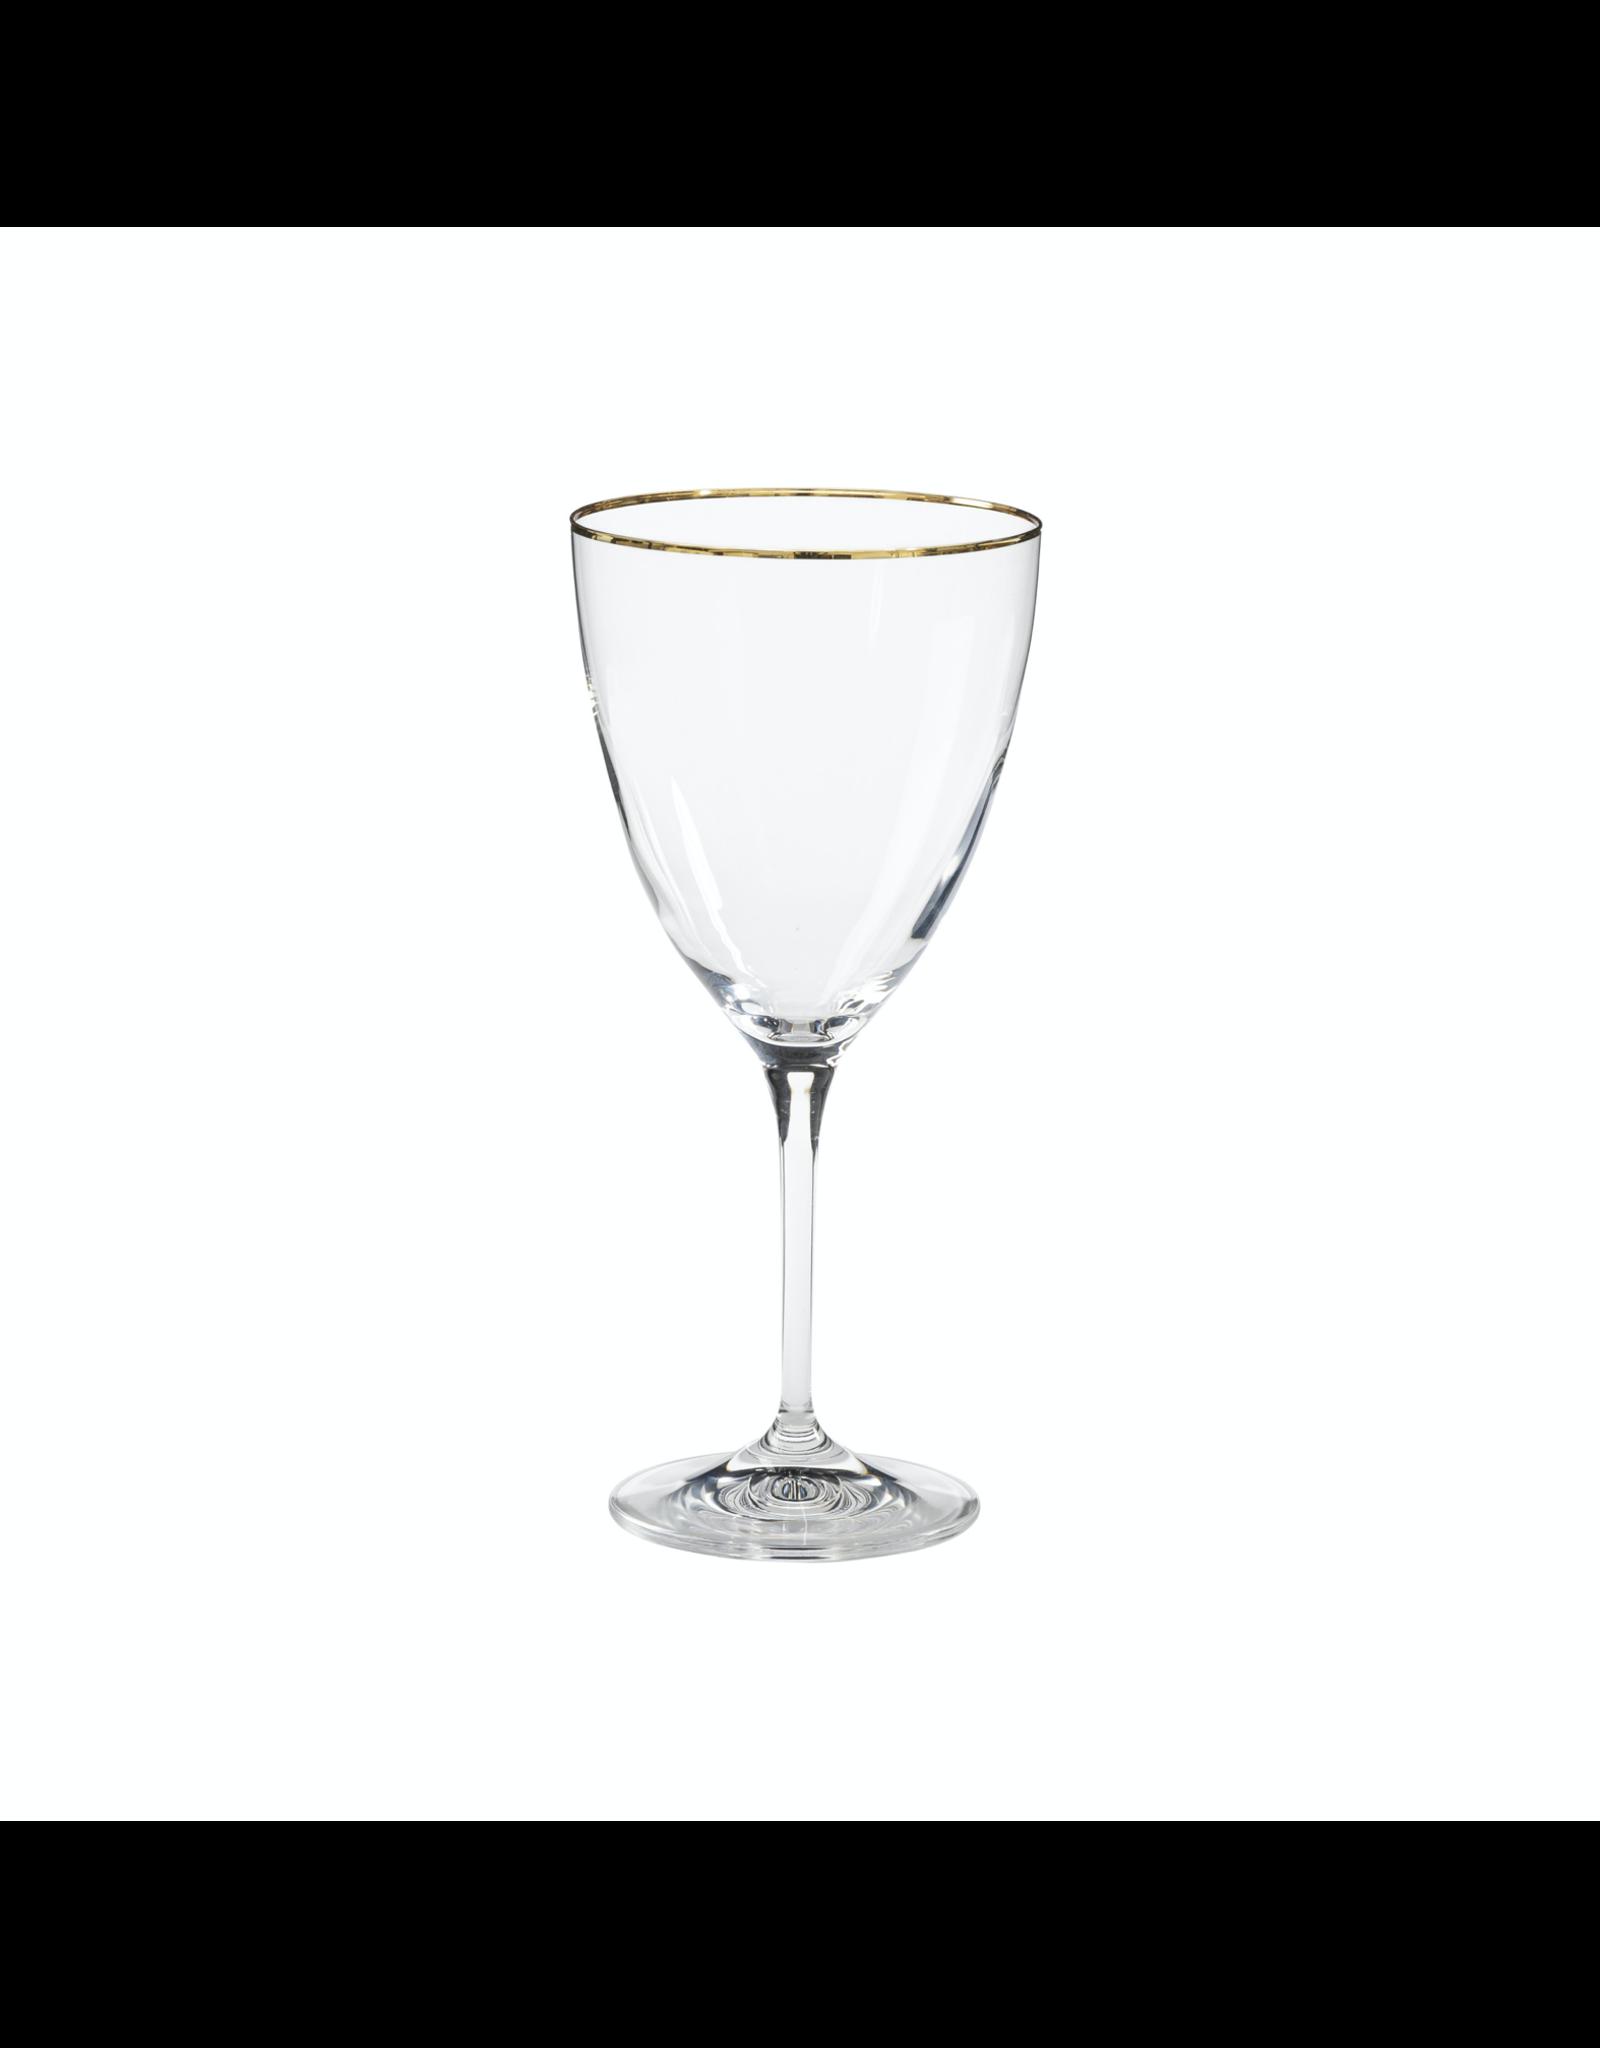 Water glass 400 ml, SENSA, clear w/ golden rim